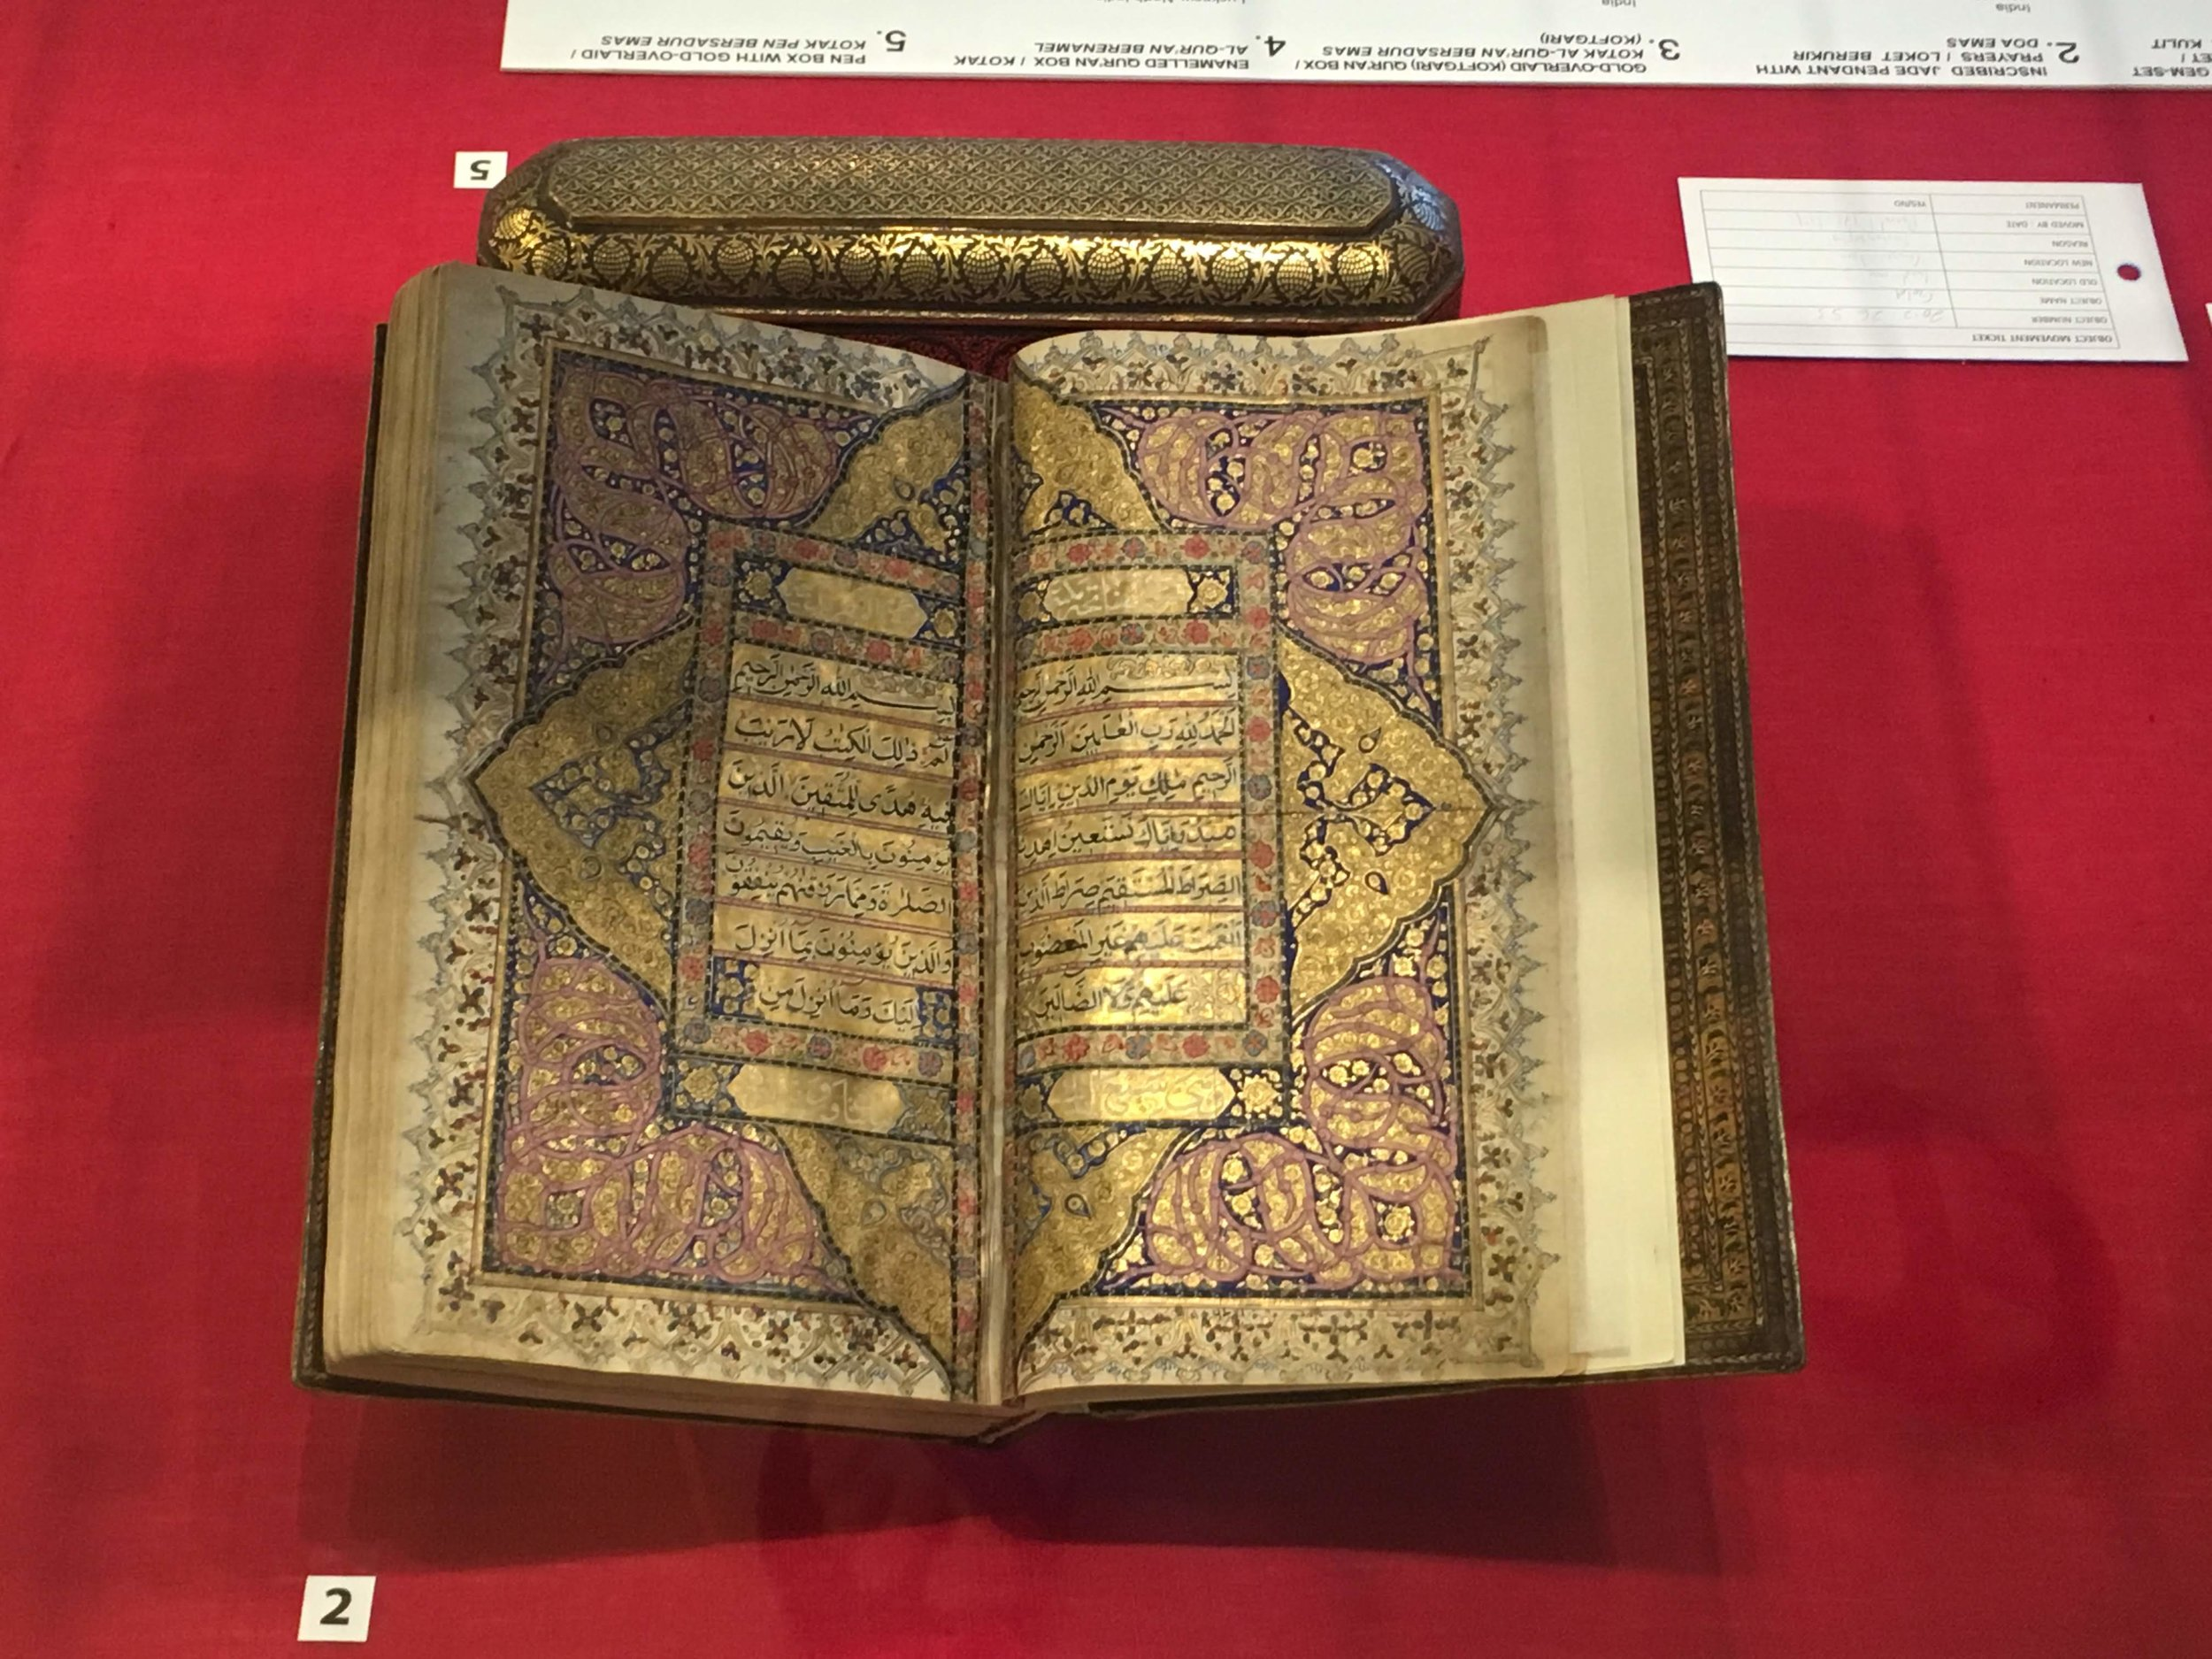 a beautiful Quran on display at the Islamic Arts Museum, Kuala Lumpur, Malaysia